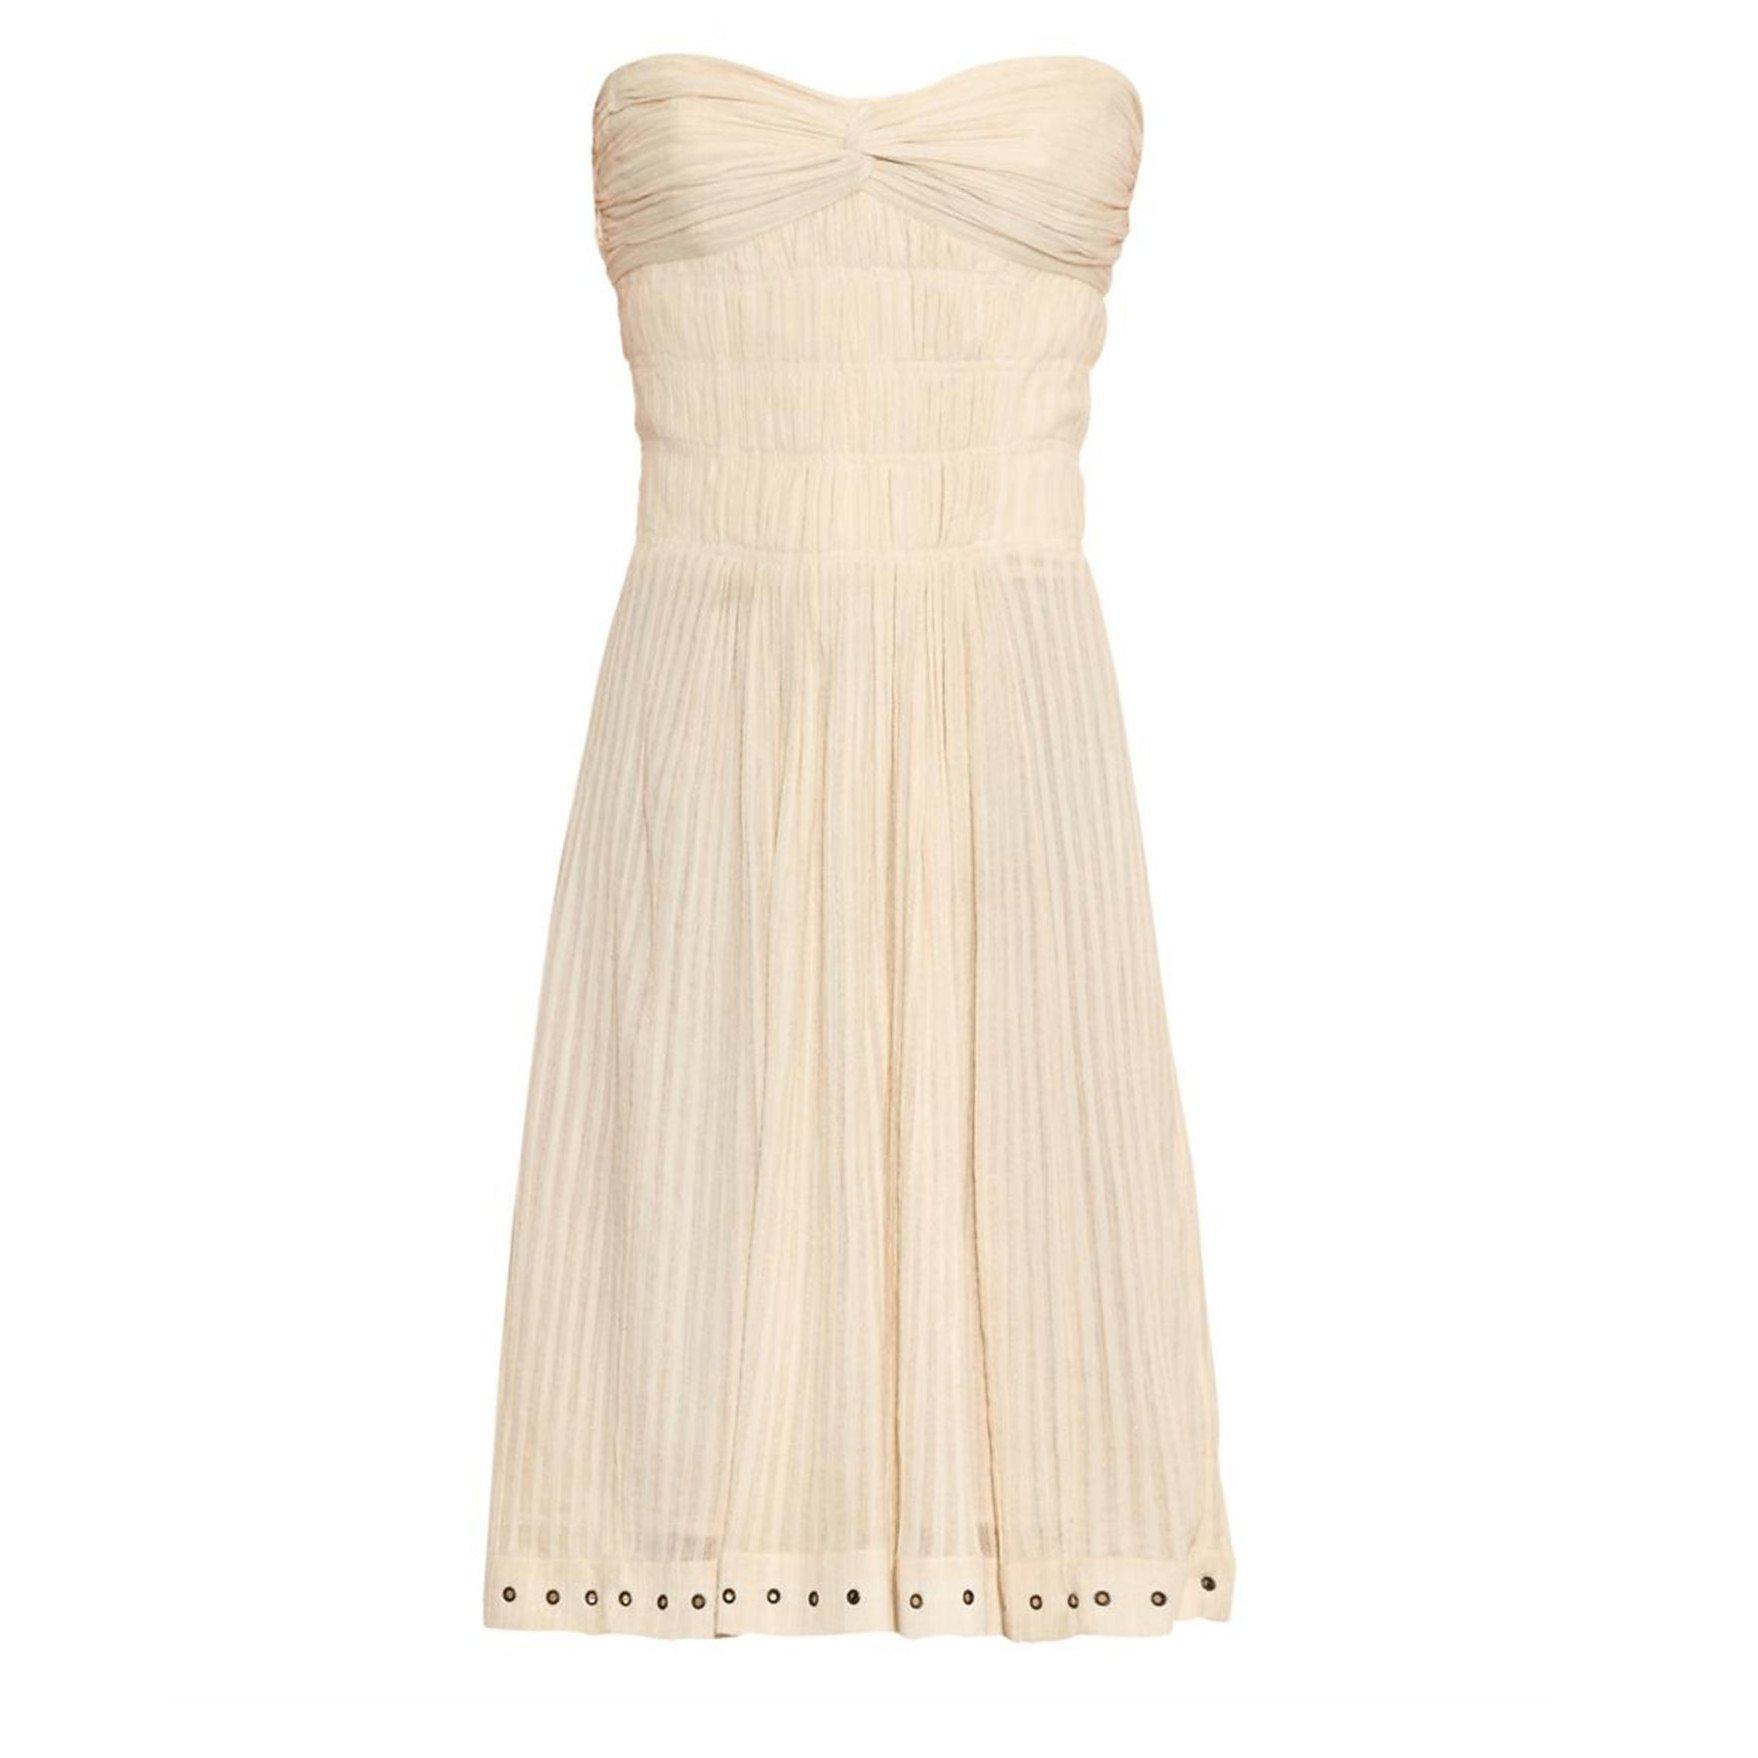 Isabel Marant Étoile Taylor Cotton-Muslin Dress